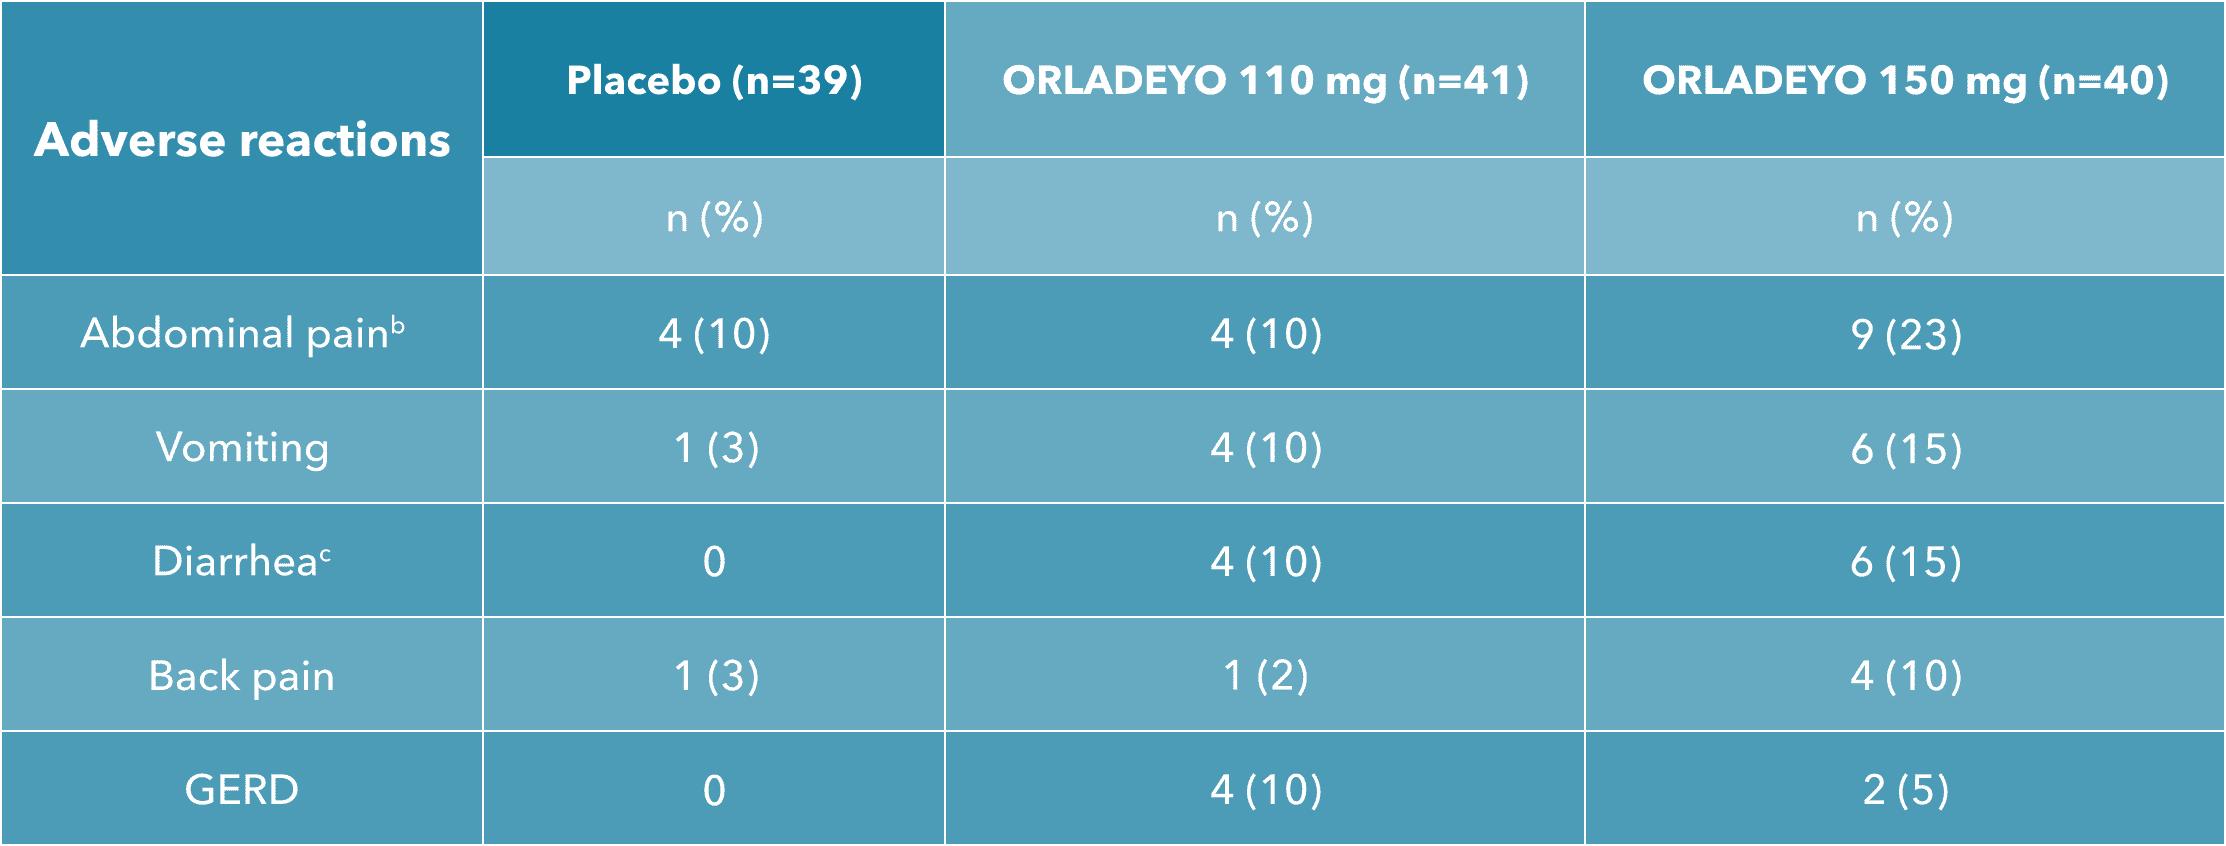 ORLADEYO™ APeX-2 study adverse reaction summary